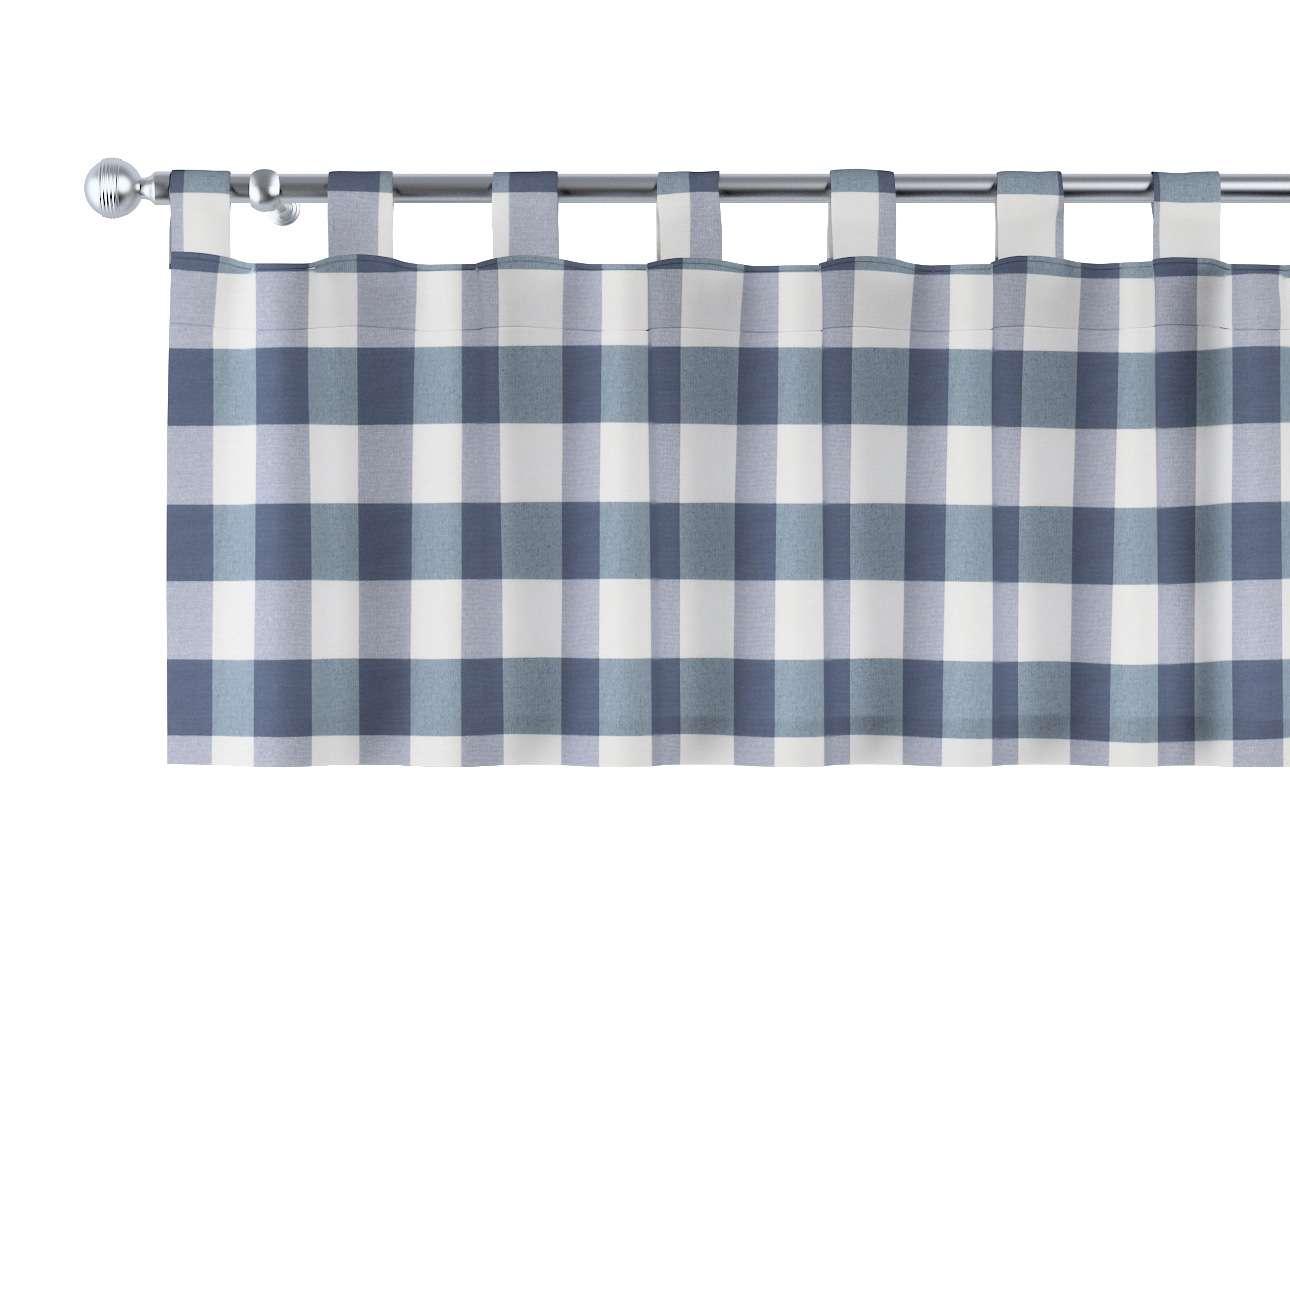 Lambrekin na szelkach 130x40cm w kolekcji Quadro, tkanina: 136-03